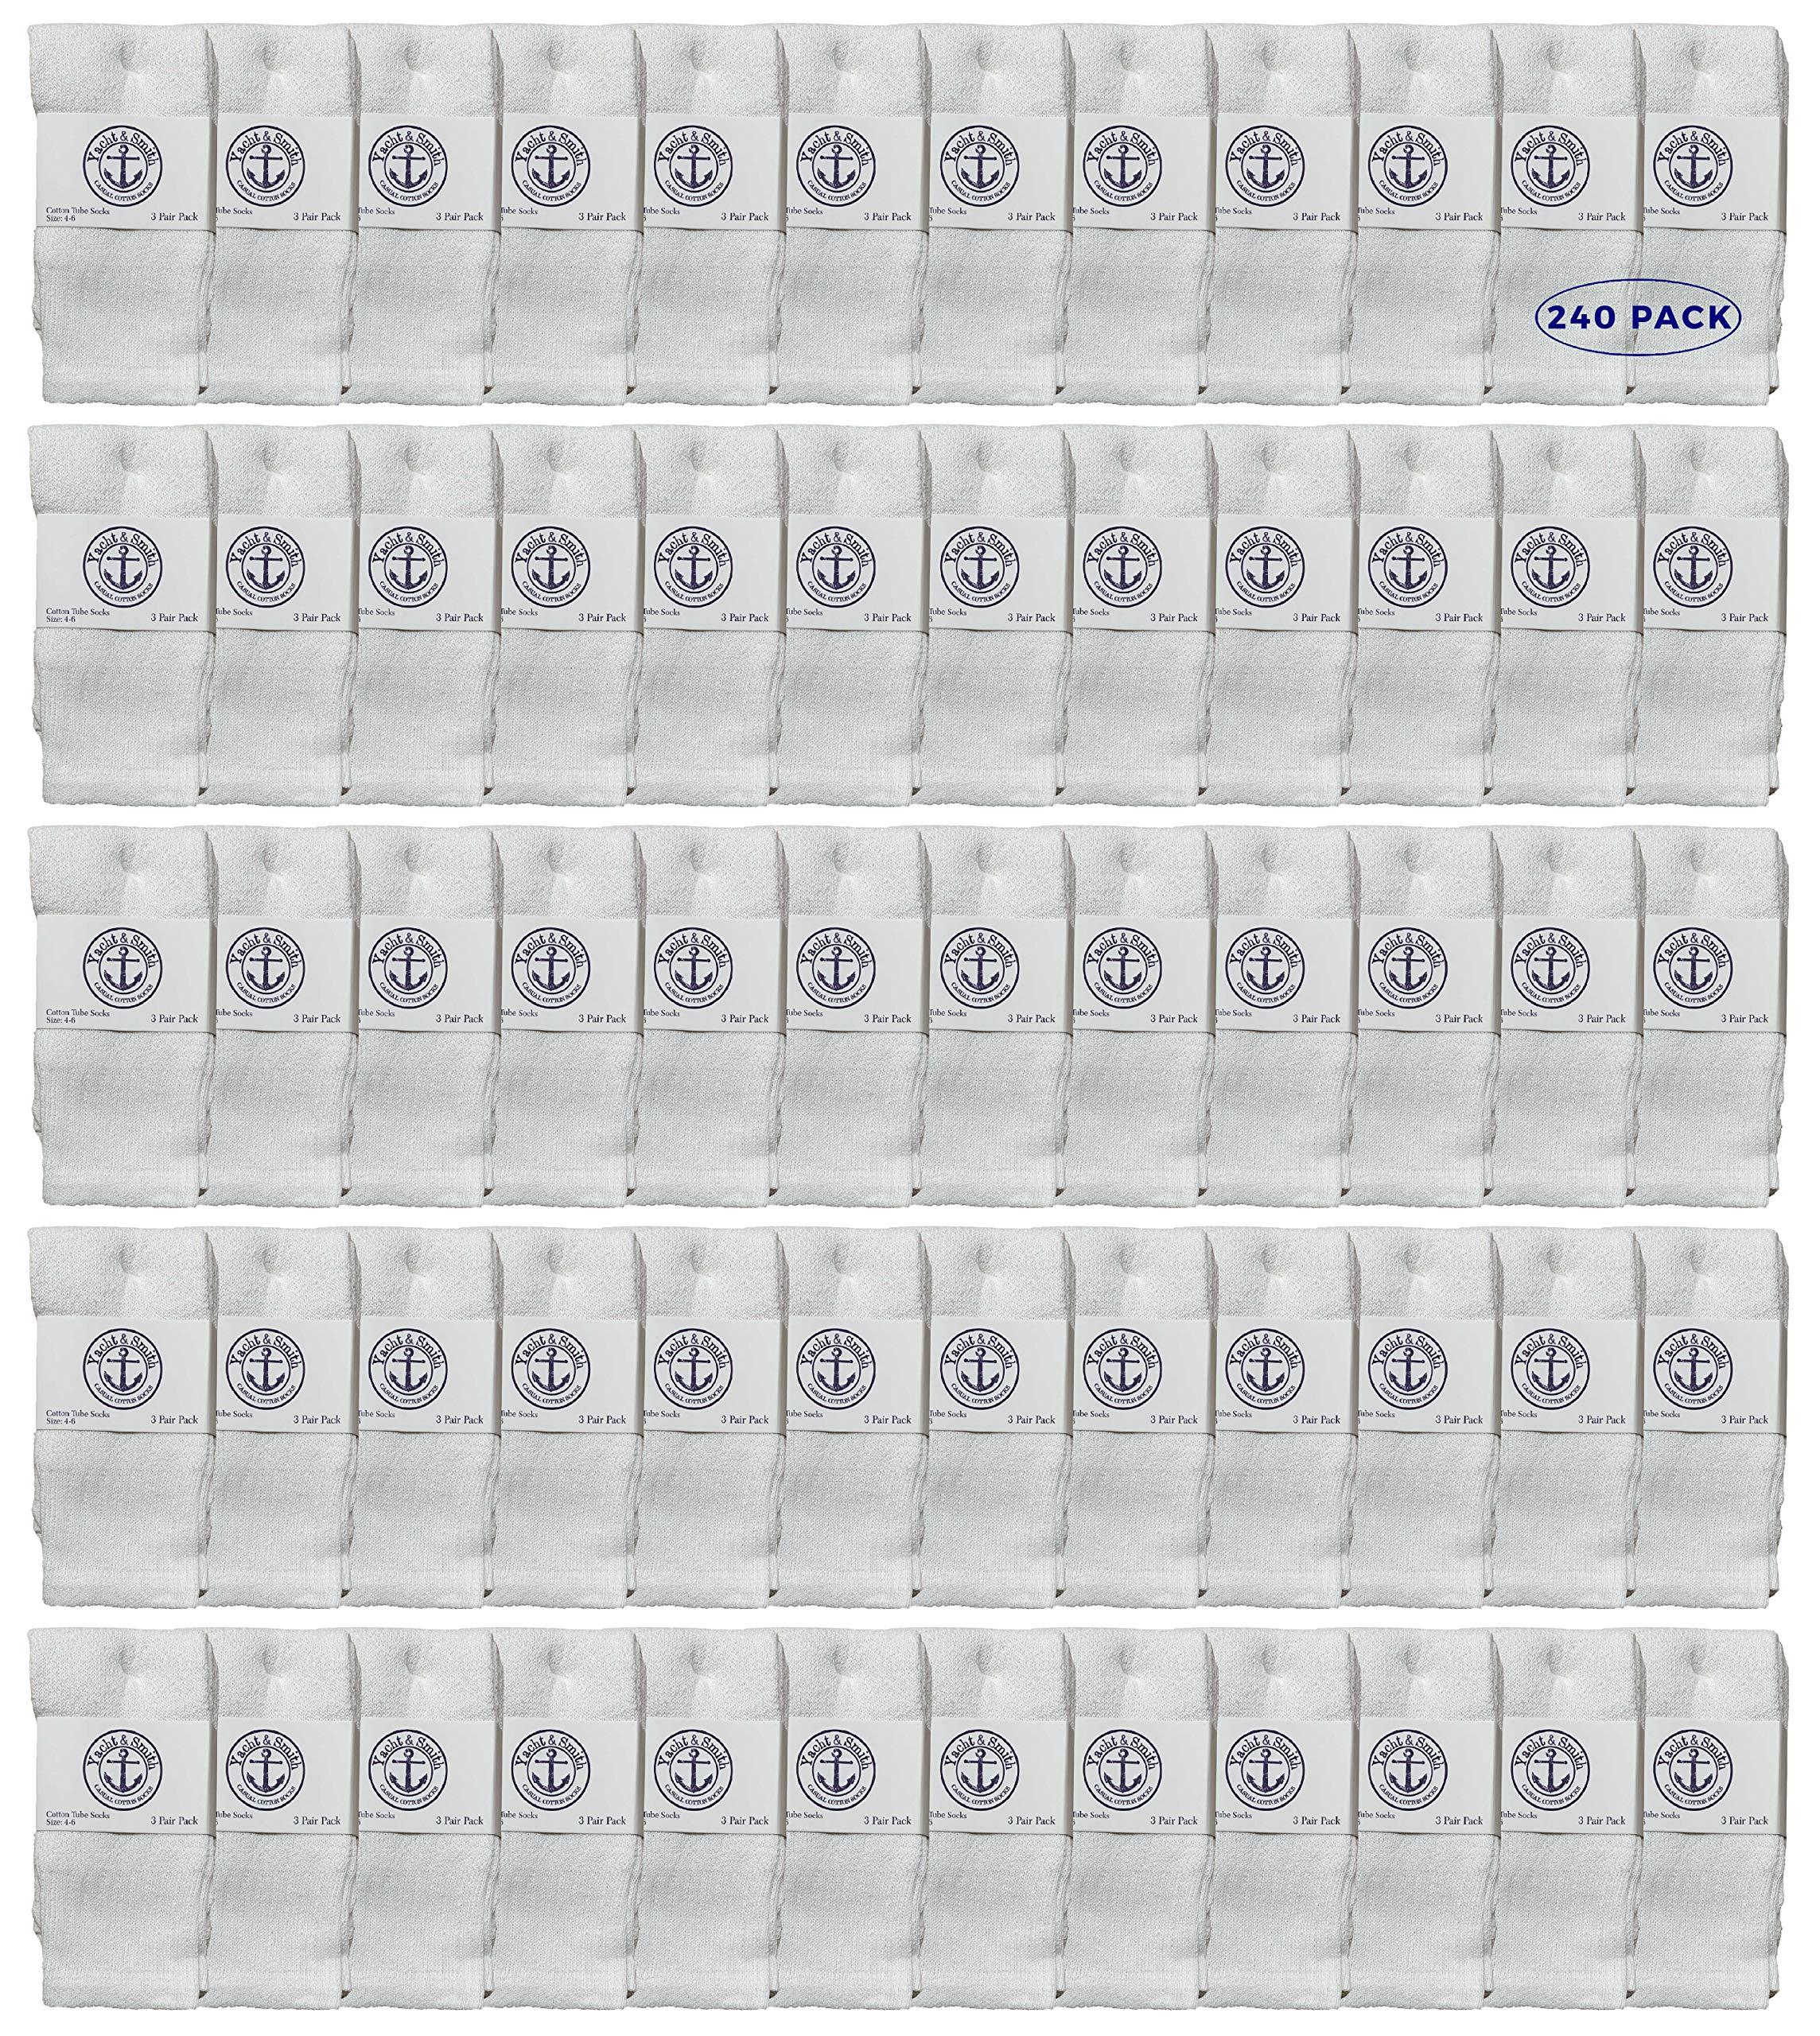 Yacht & Smith Wholesale Kids Tube Socks, Cotton Bulk Sport Socks Size 4-20 by Yacht & Smith